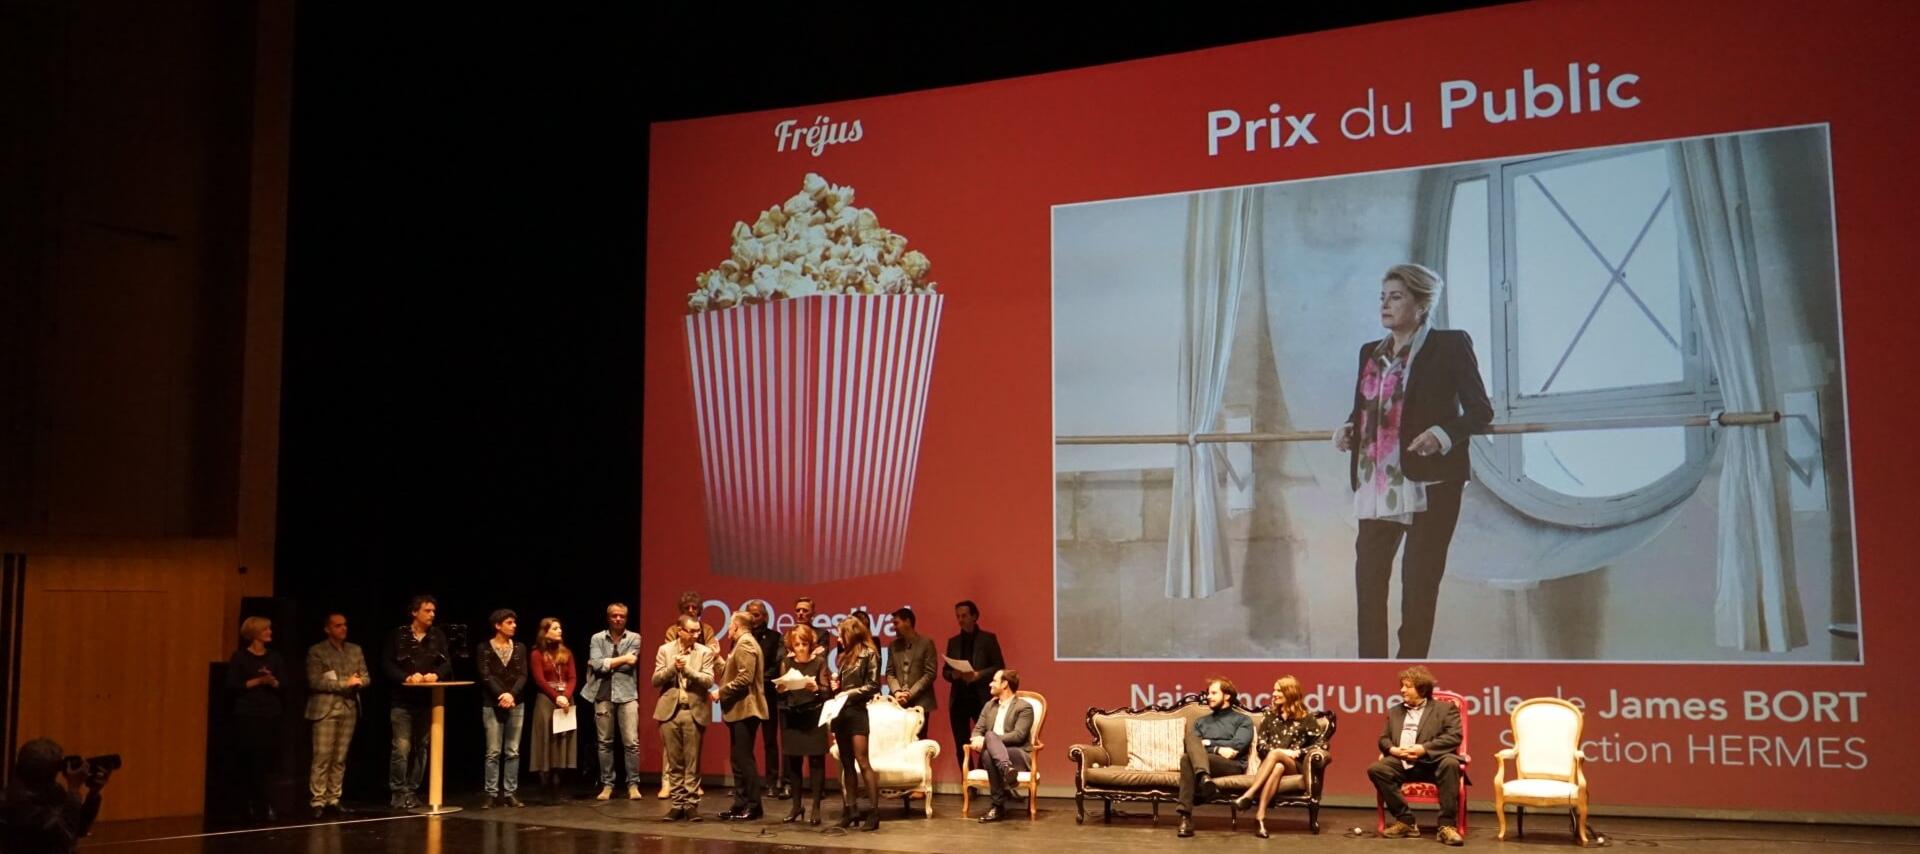 24th Short Film Festival - CGH Résidences